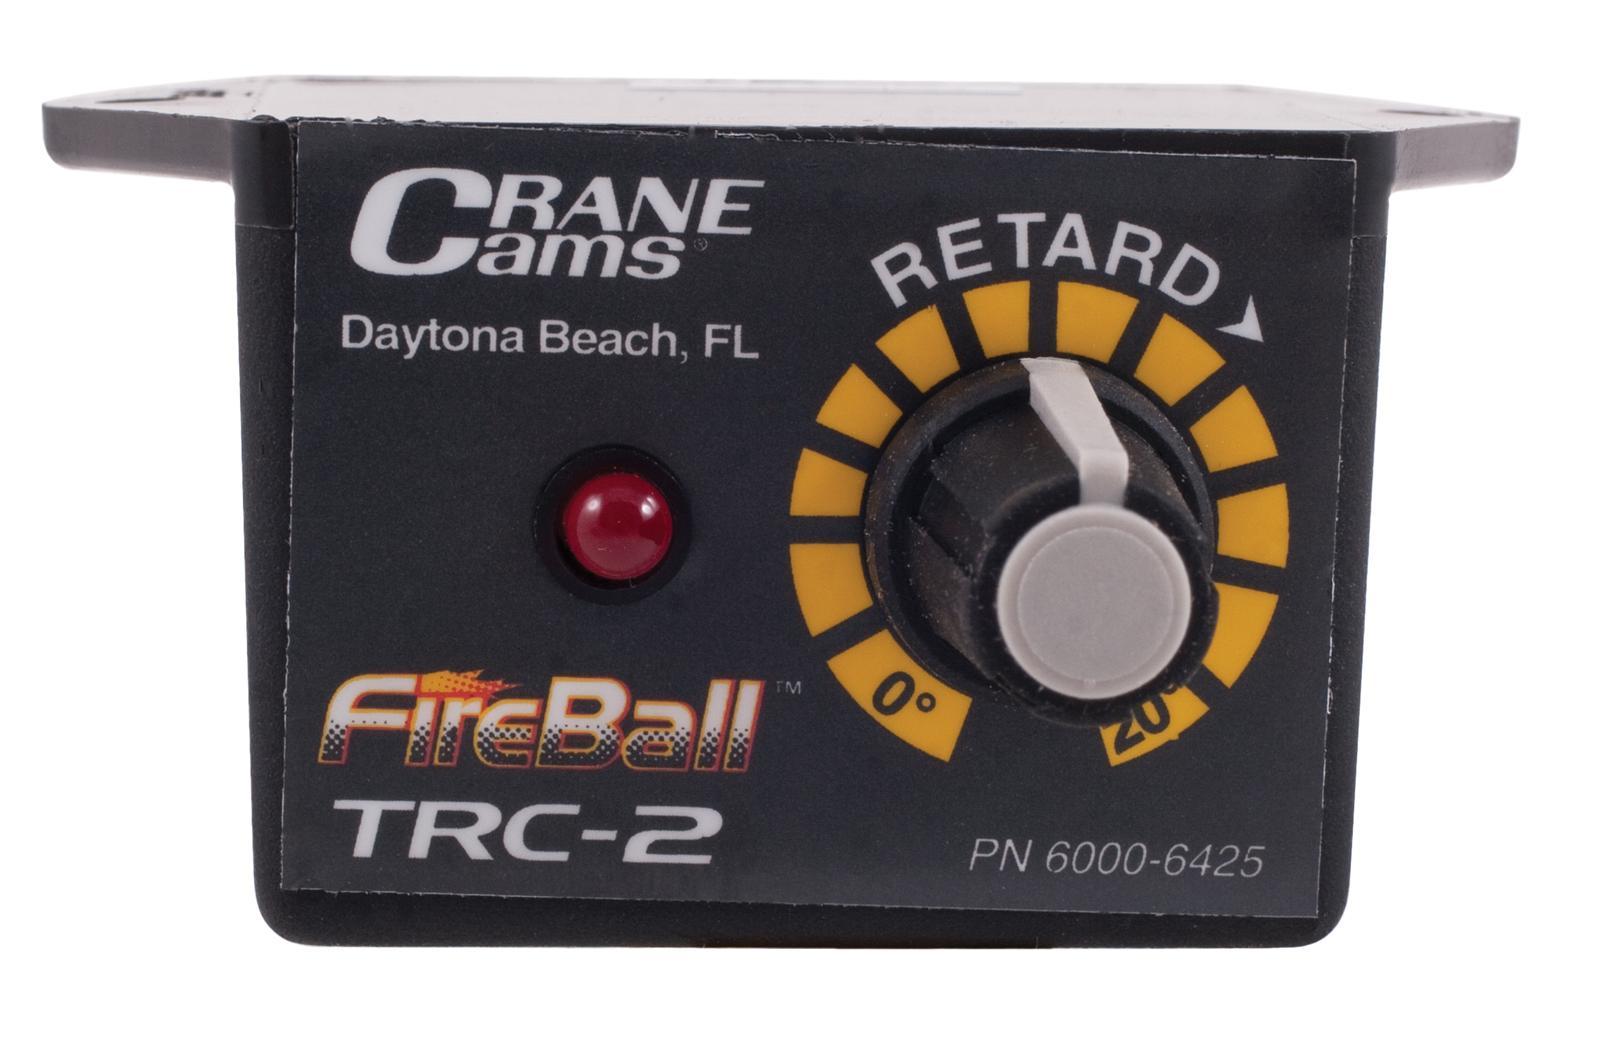 CRN 6000 6425_RC_xl crane trc2 wiring diagrams wiring diagrams crane ignition hi-6rc wiring diagram at bakdesigns.co